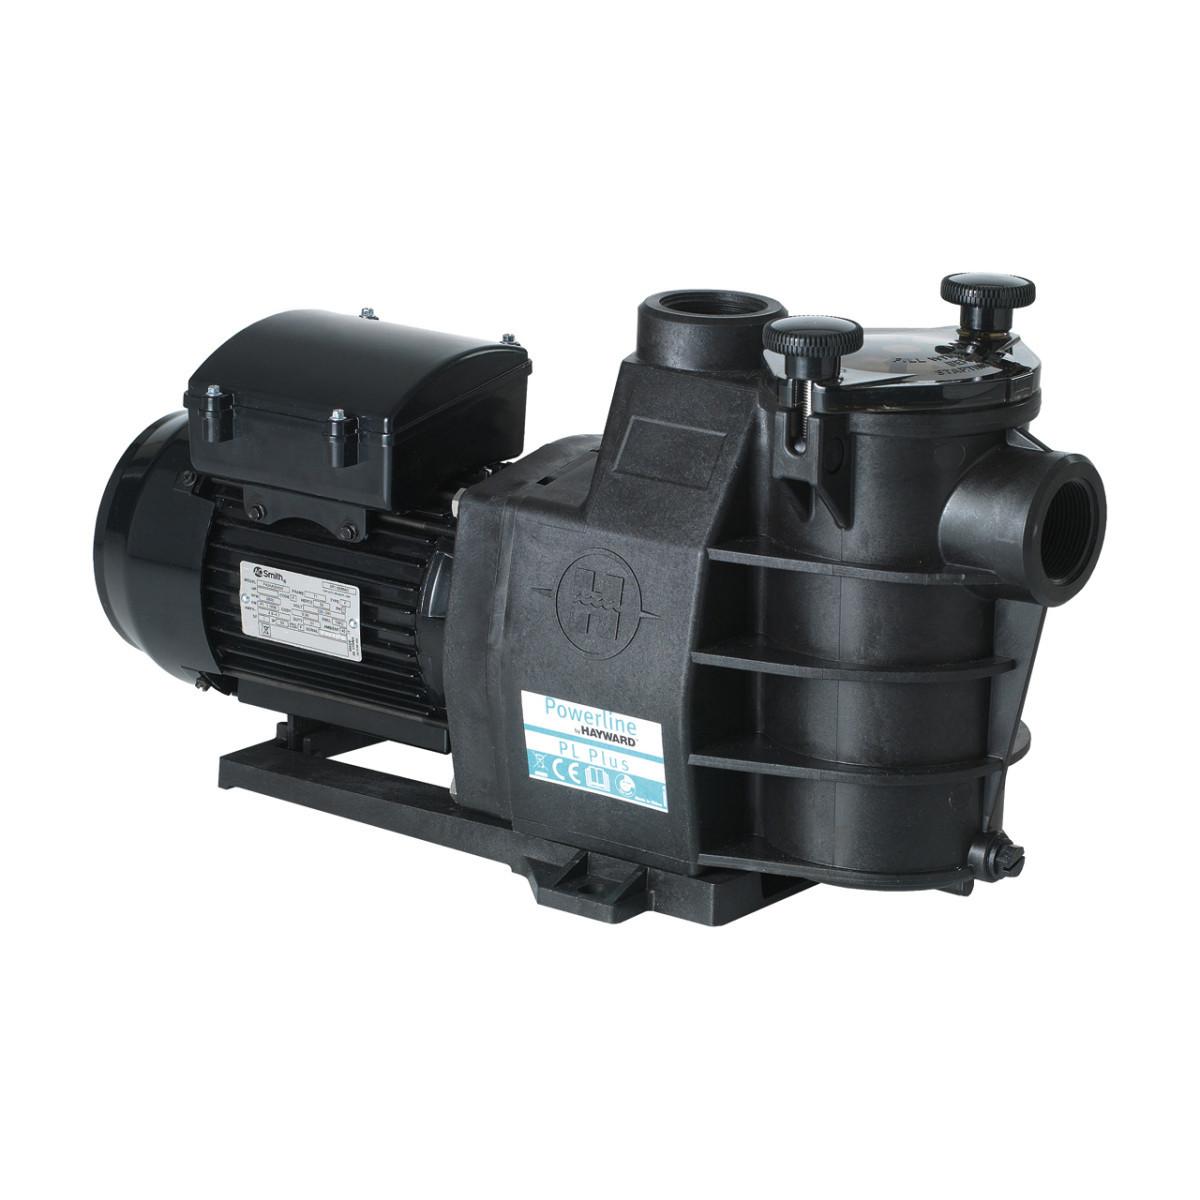 Насос Hayward PL Plus 81030 (220В, 8,6 м³/час, 0.5HP), для бассейнов объёмом до 34,4 м3